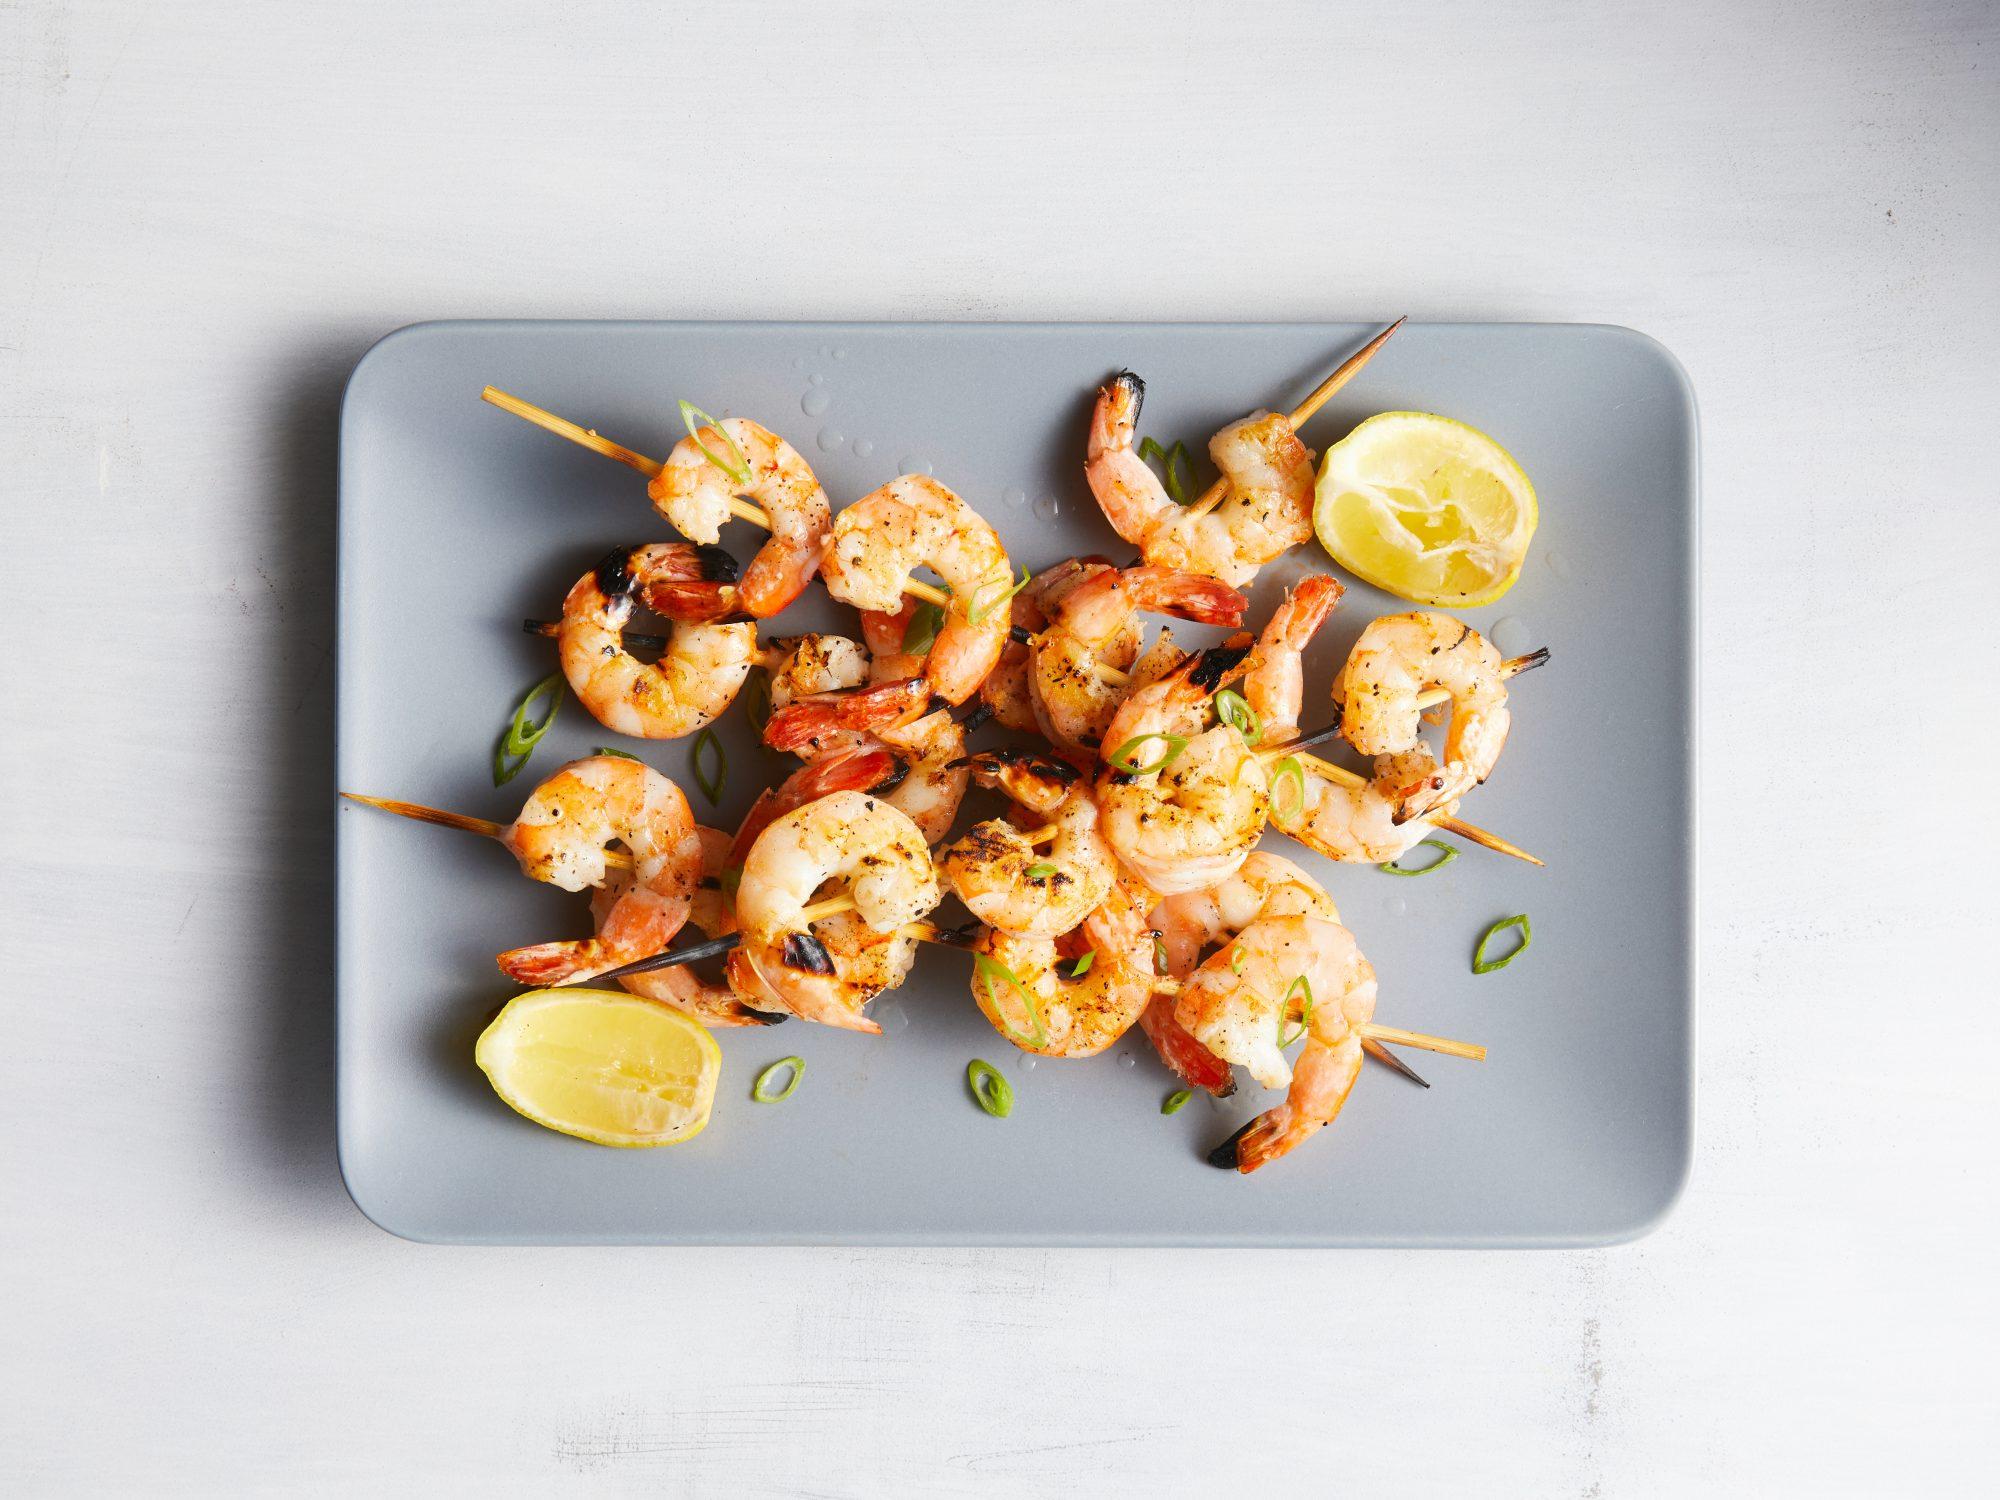 Mr Steak Grill Review Shrimp Image